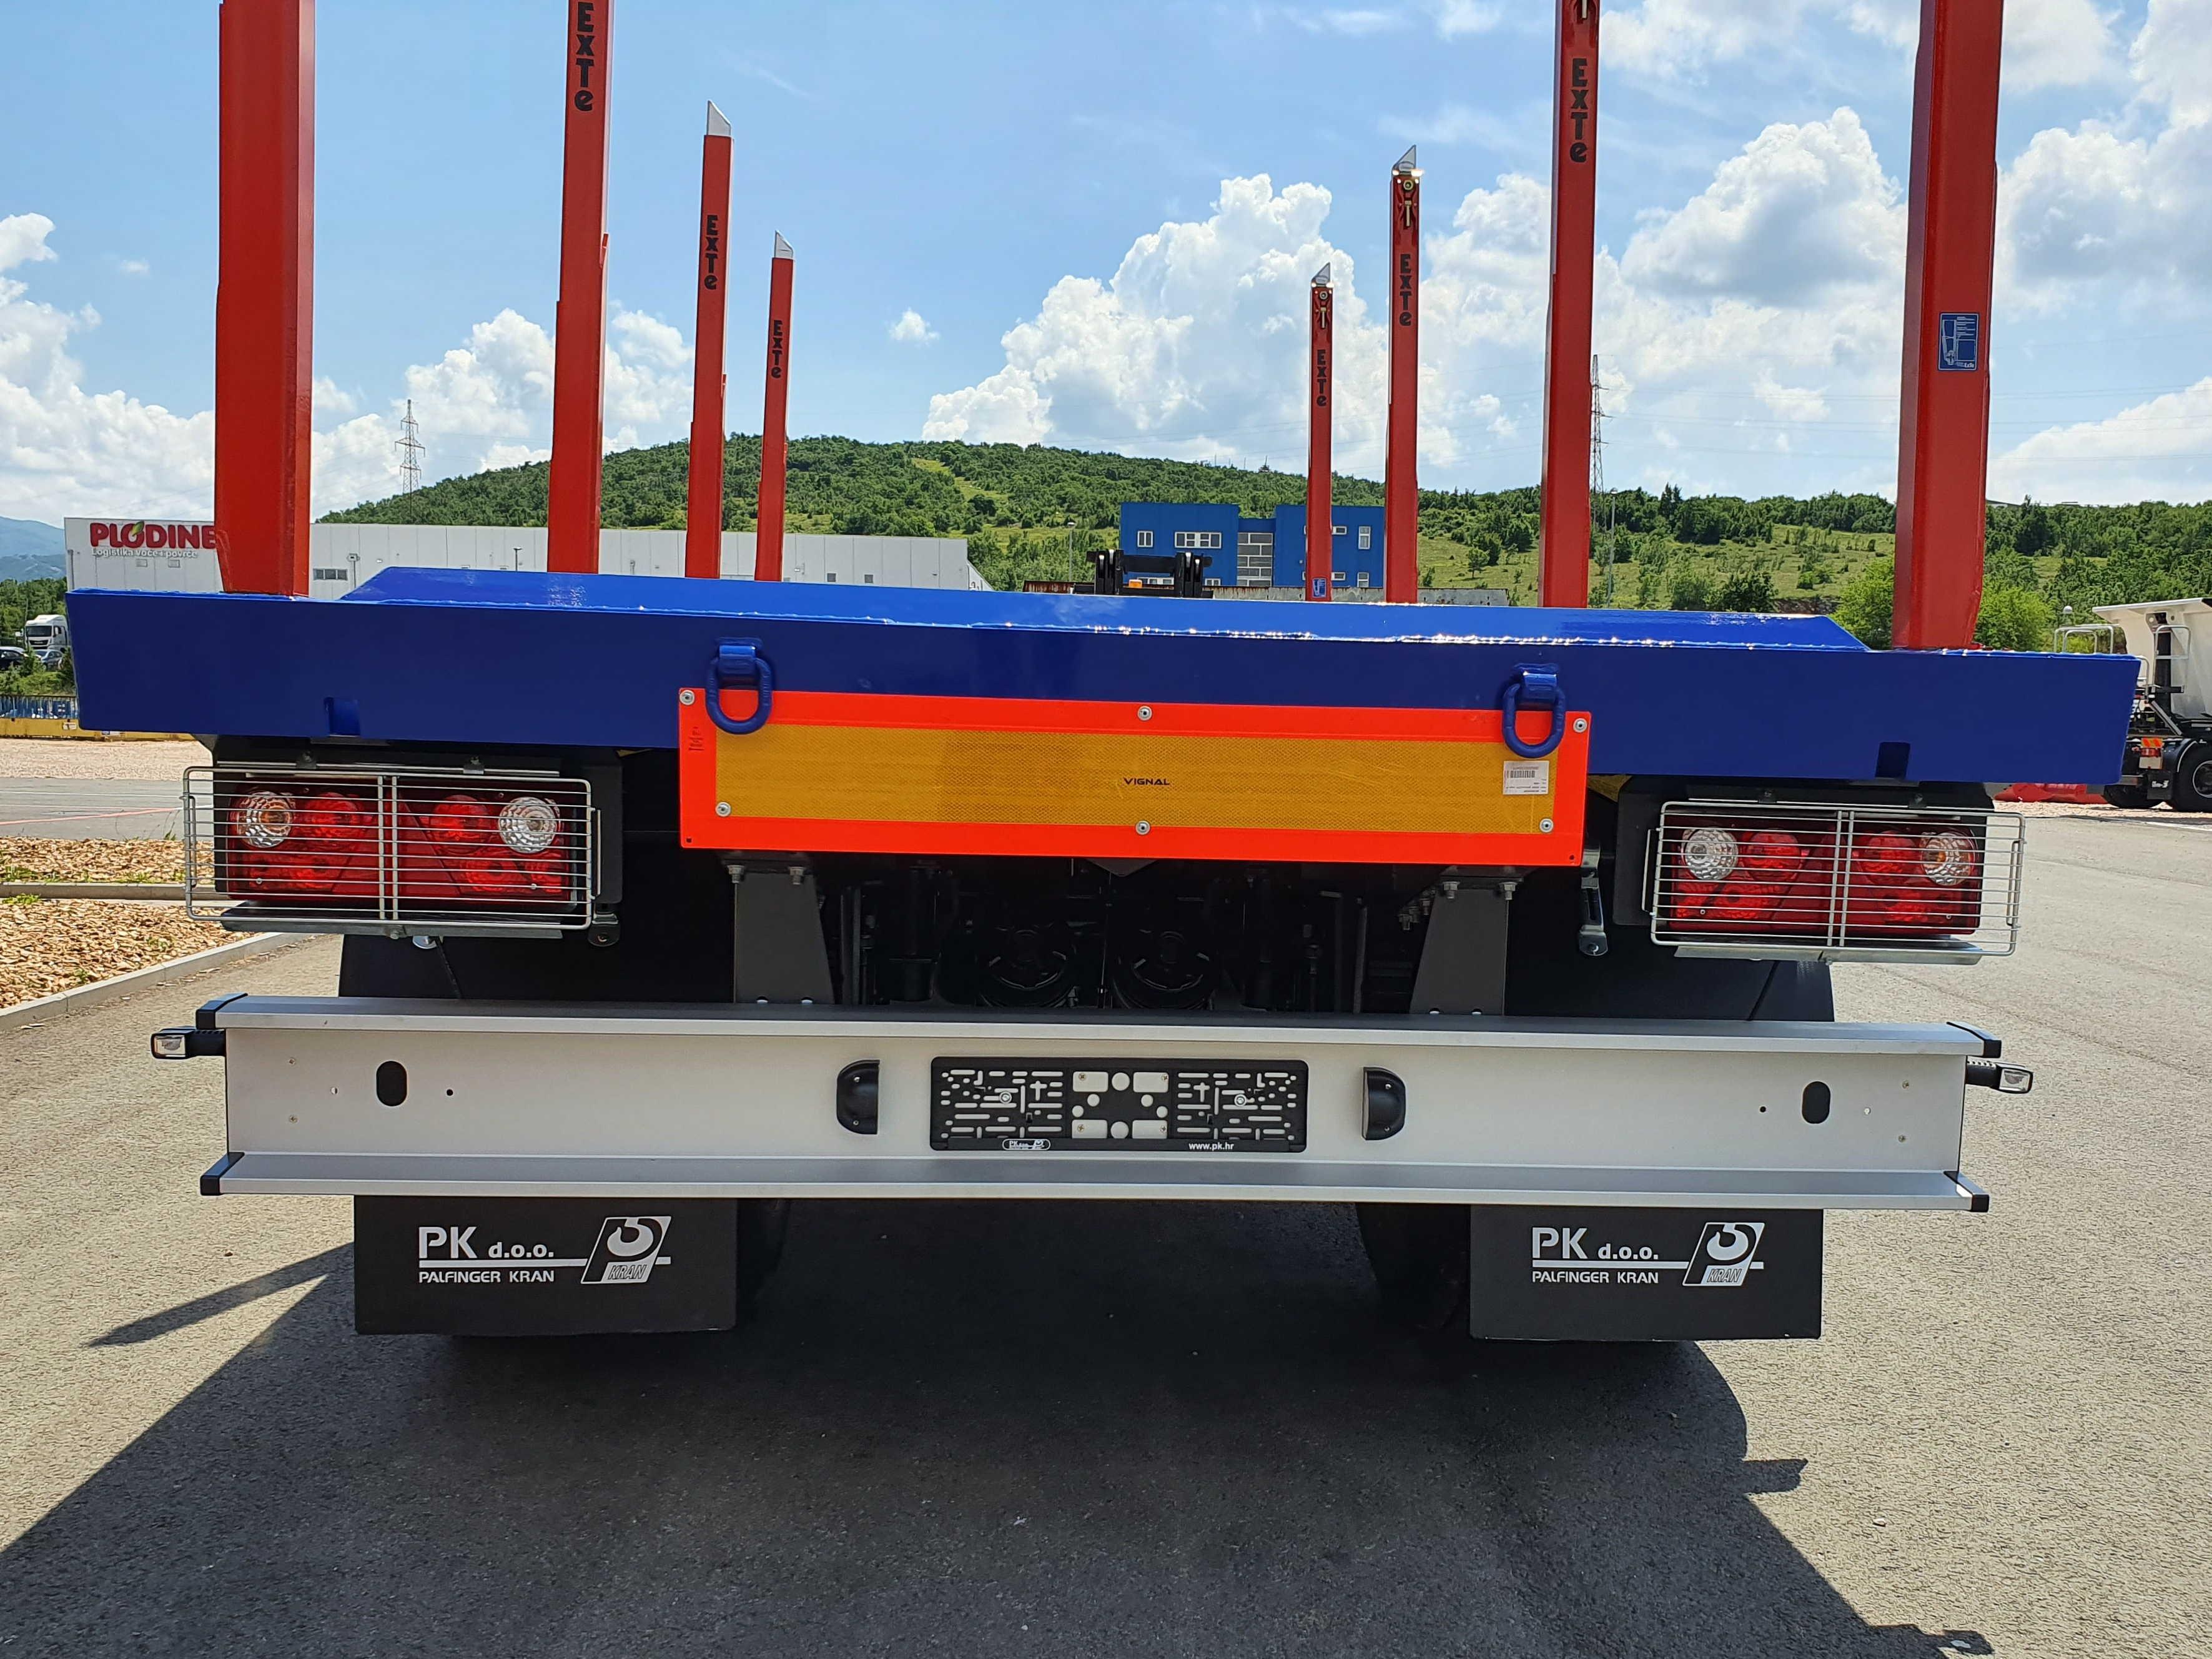 sumarska-prikolica-transport-trupaca-psm240_6